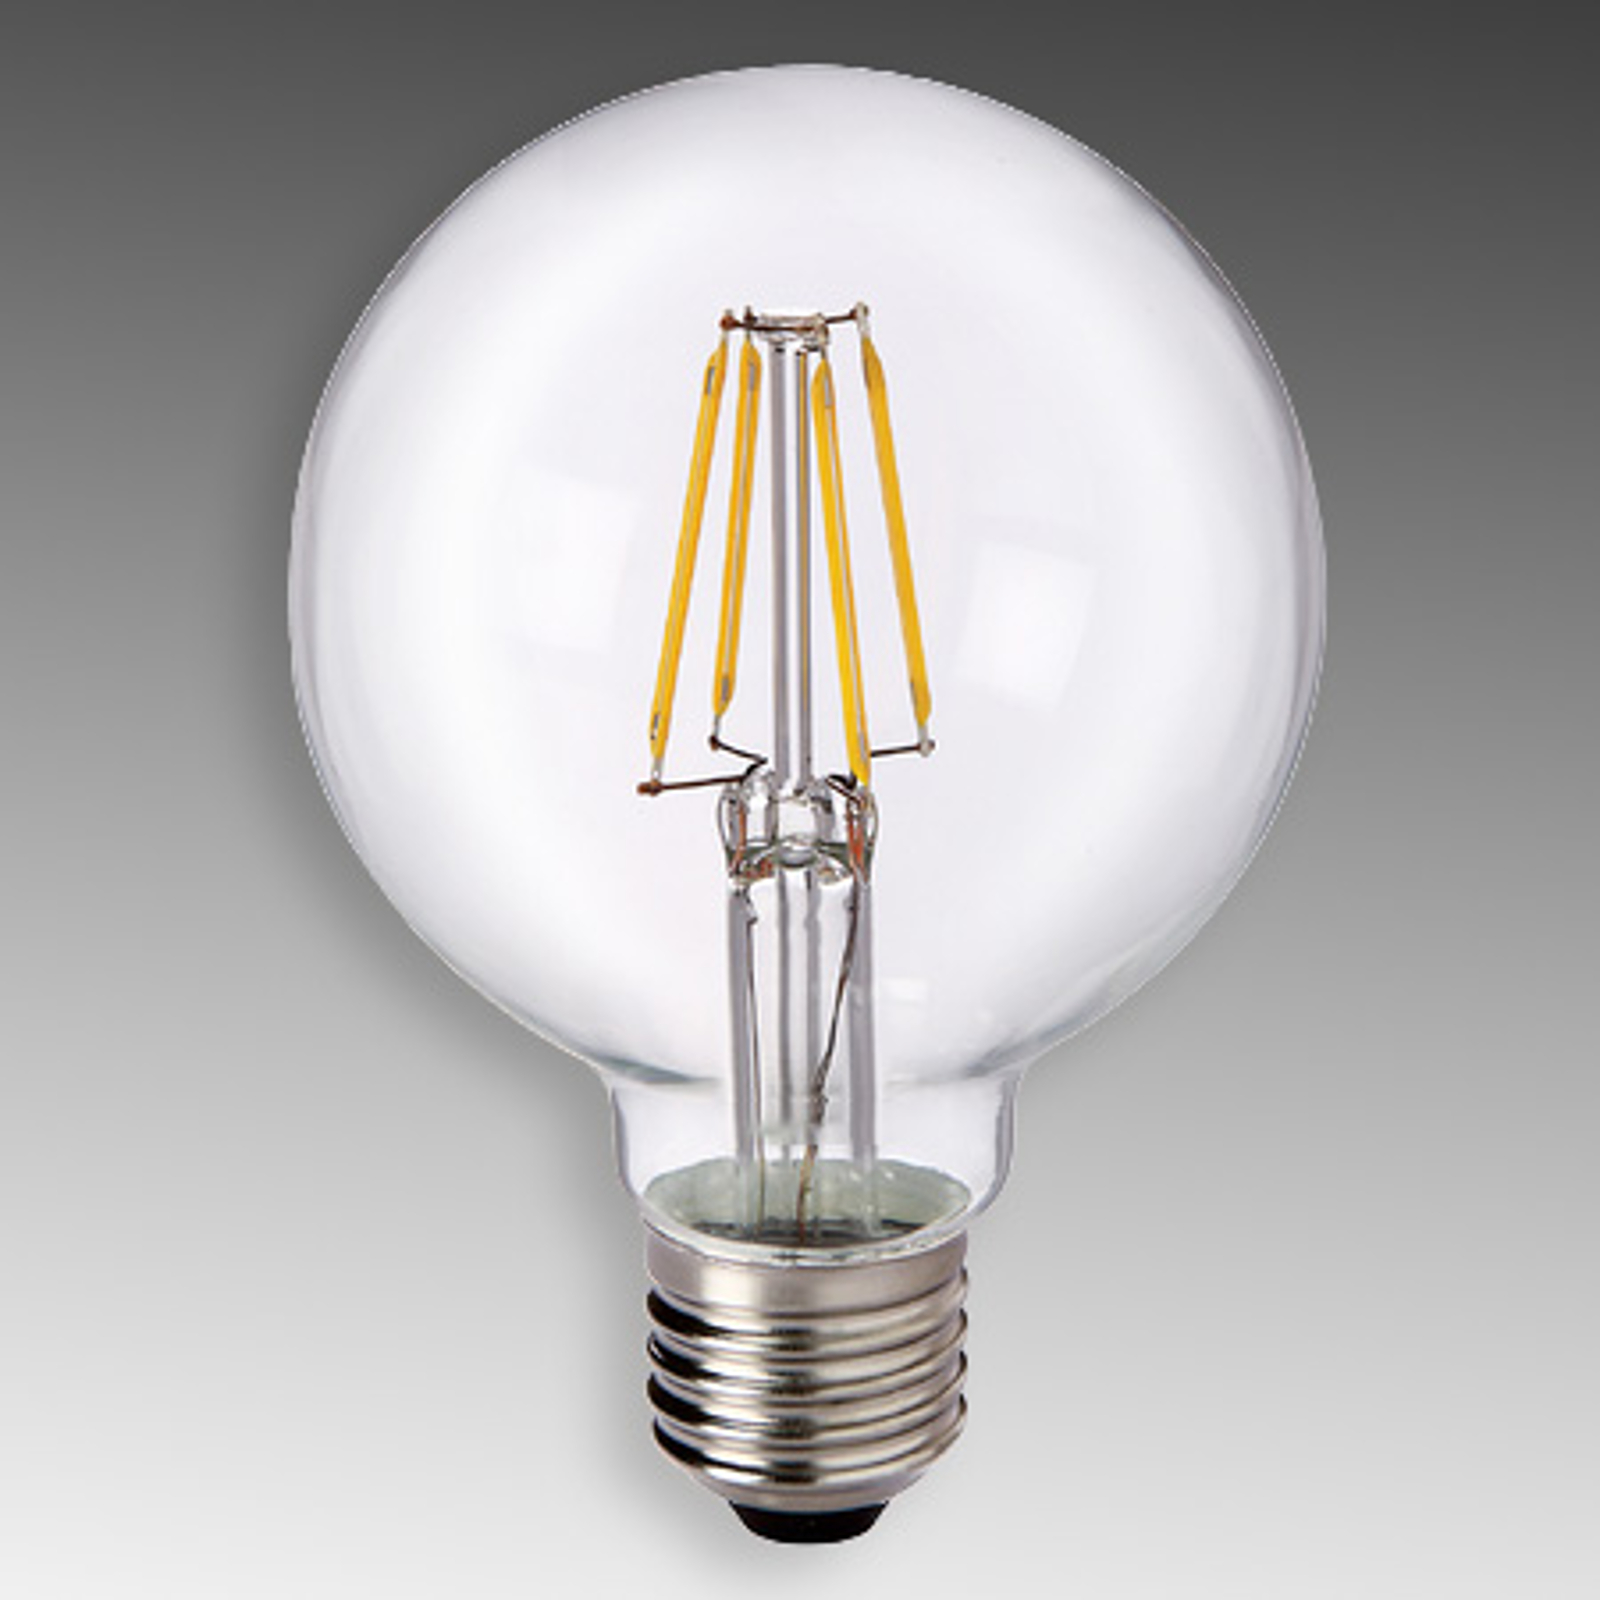 Globo LED 827 G80 E27 6W chiaro